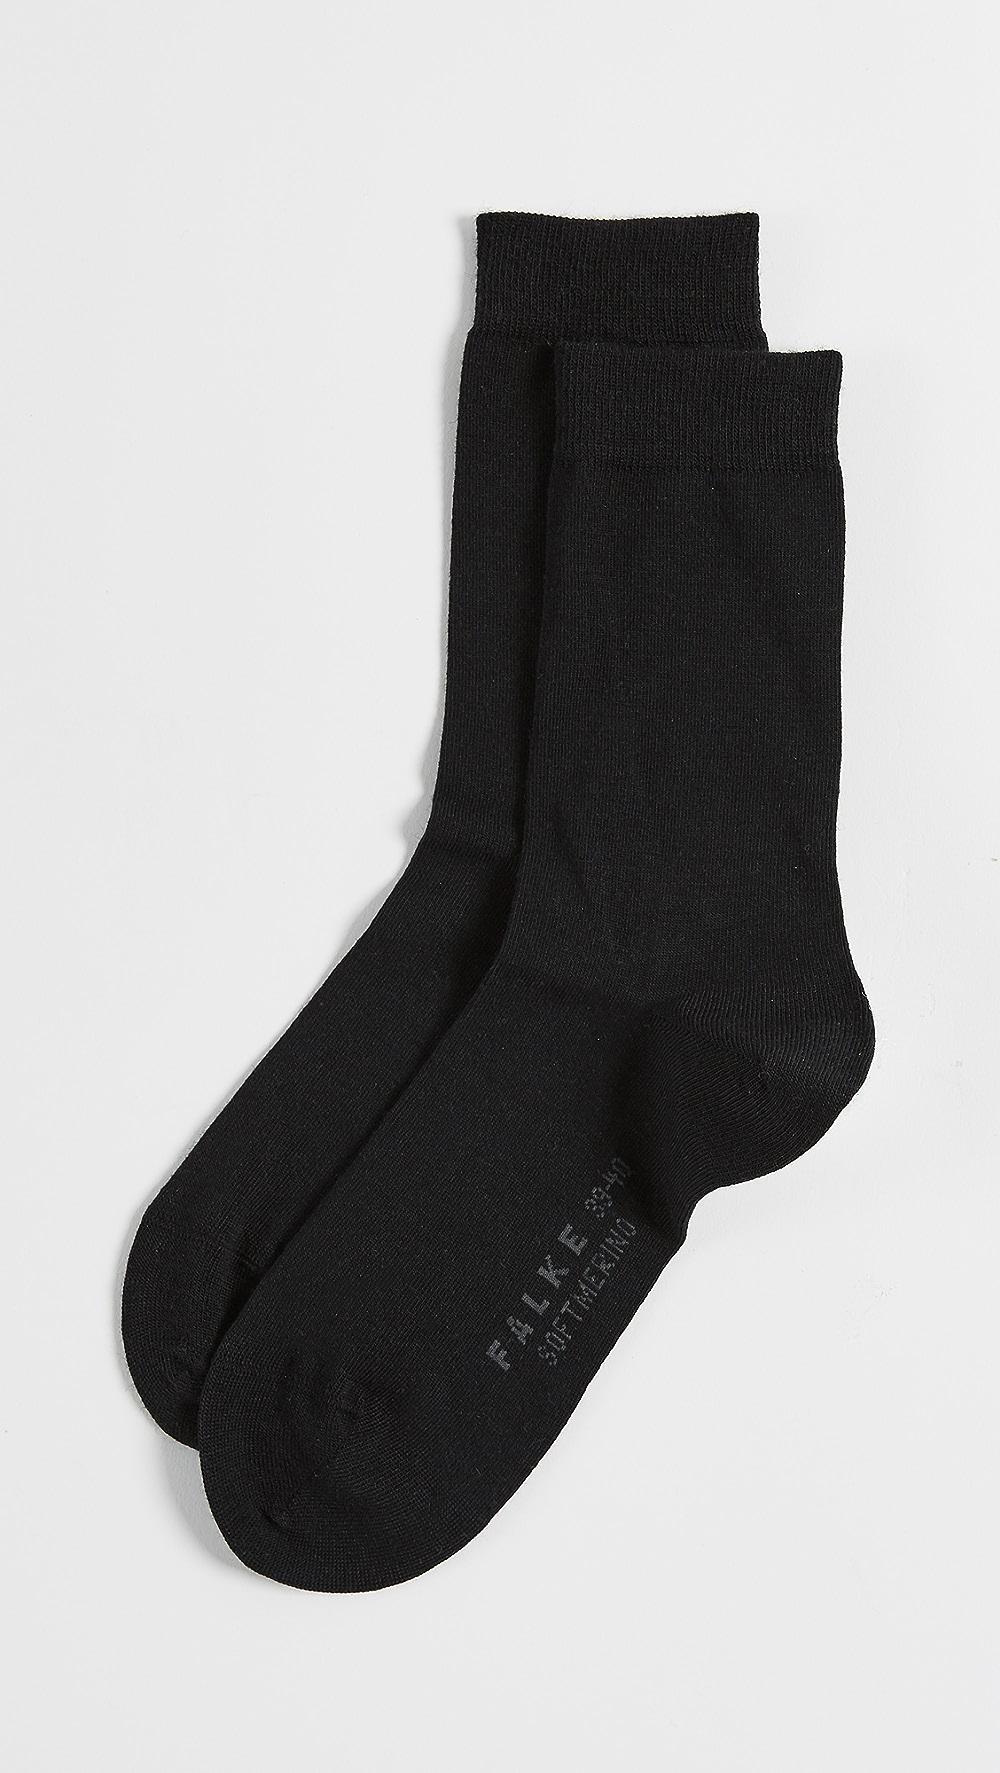 Impartial Falke - Soft Merino Socks Driving A Roaring Trade